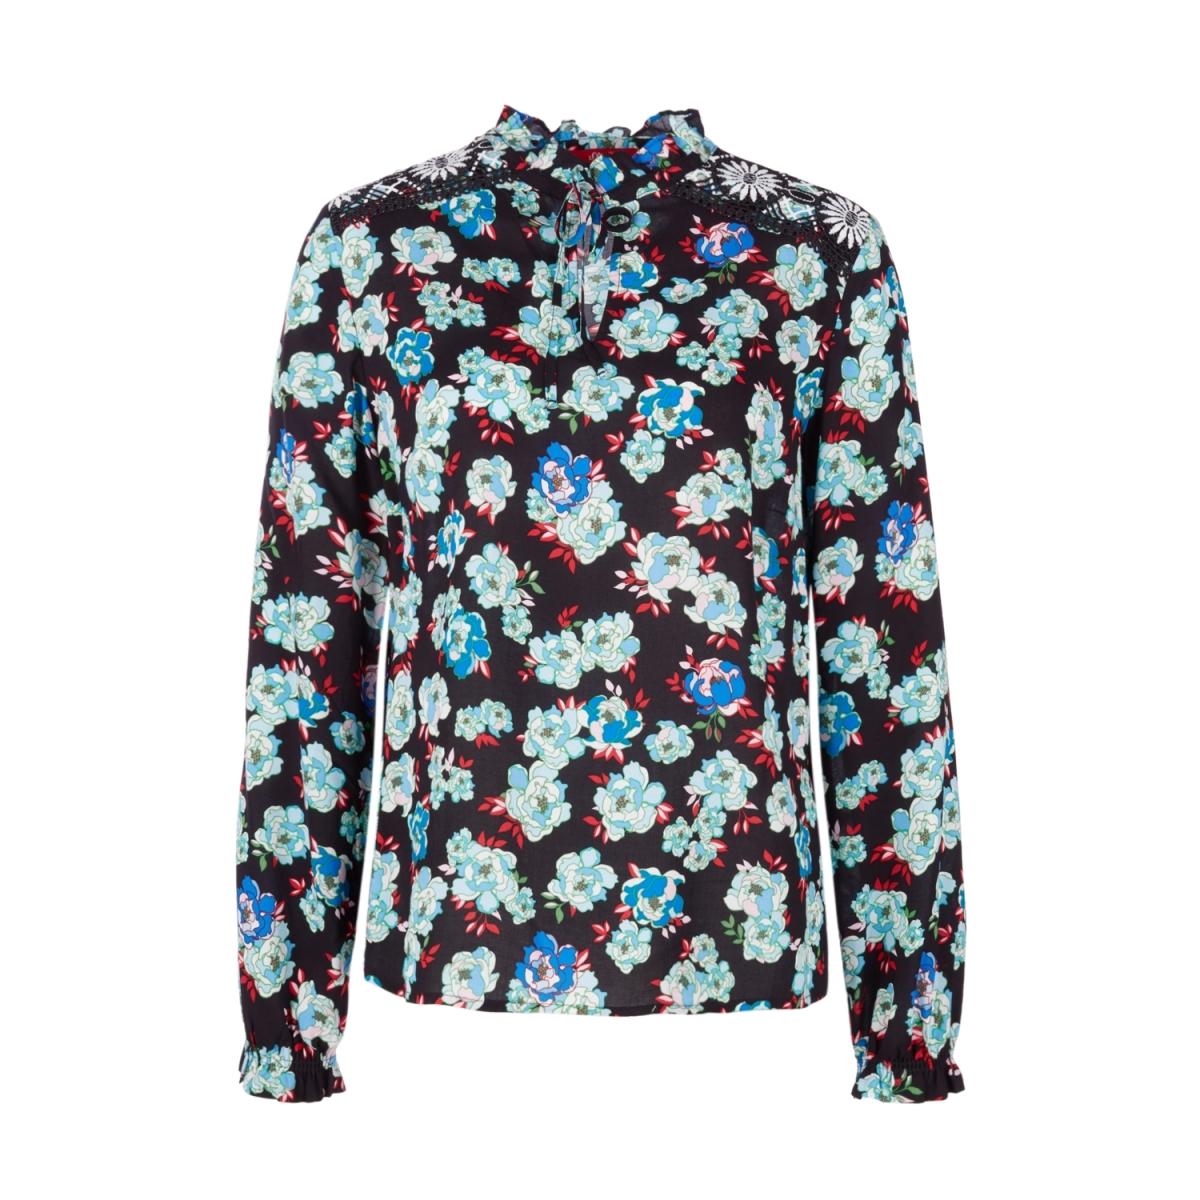 14901112055 s.oliver blouse 99c2